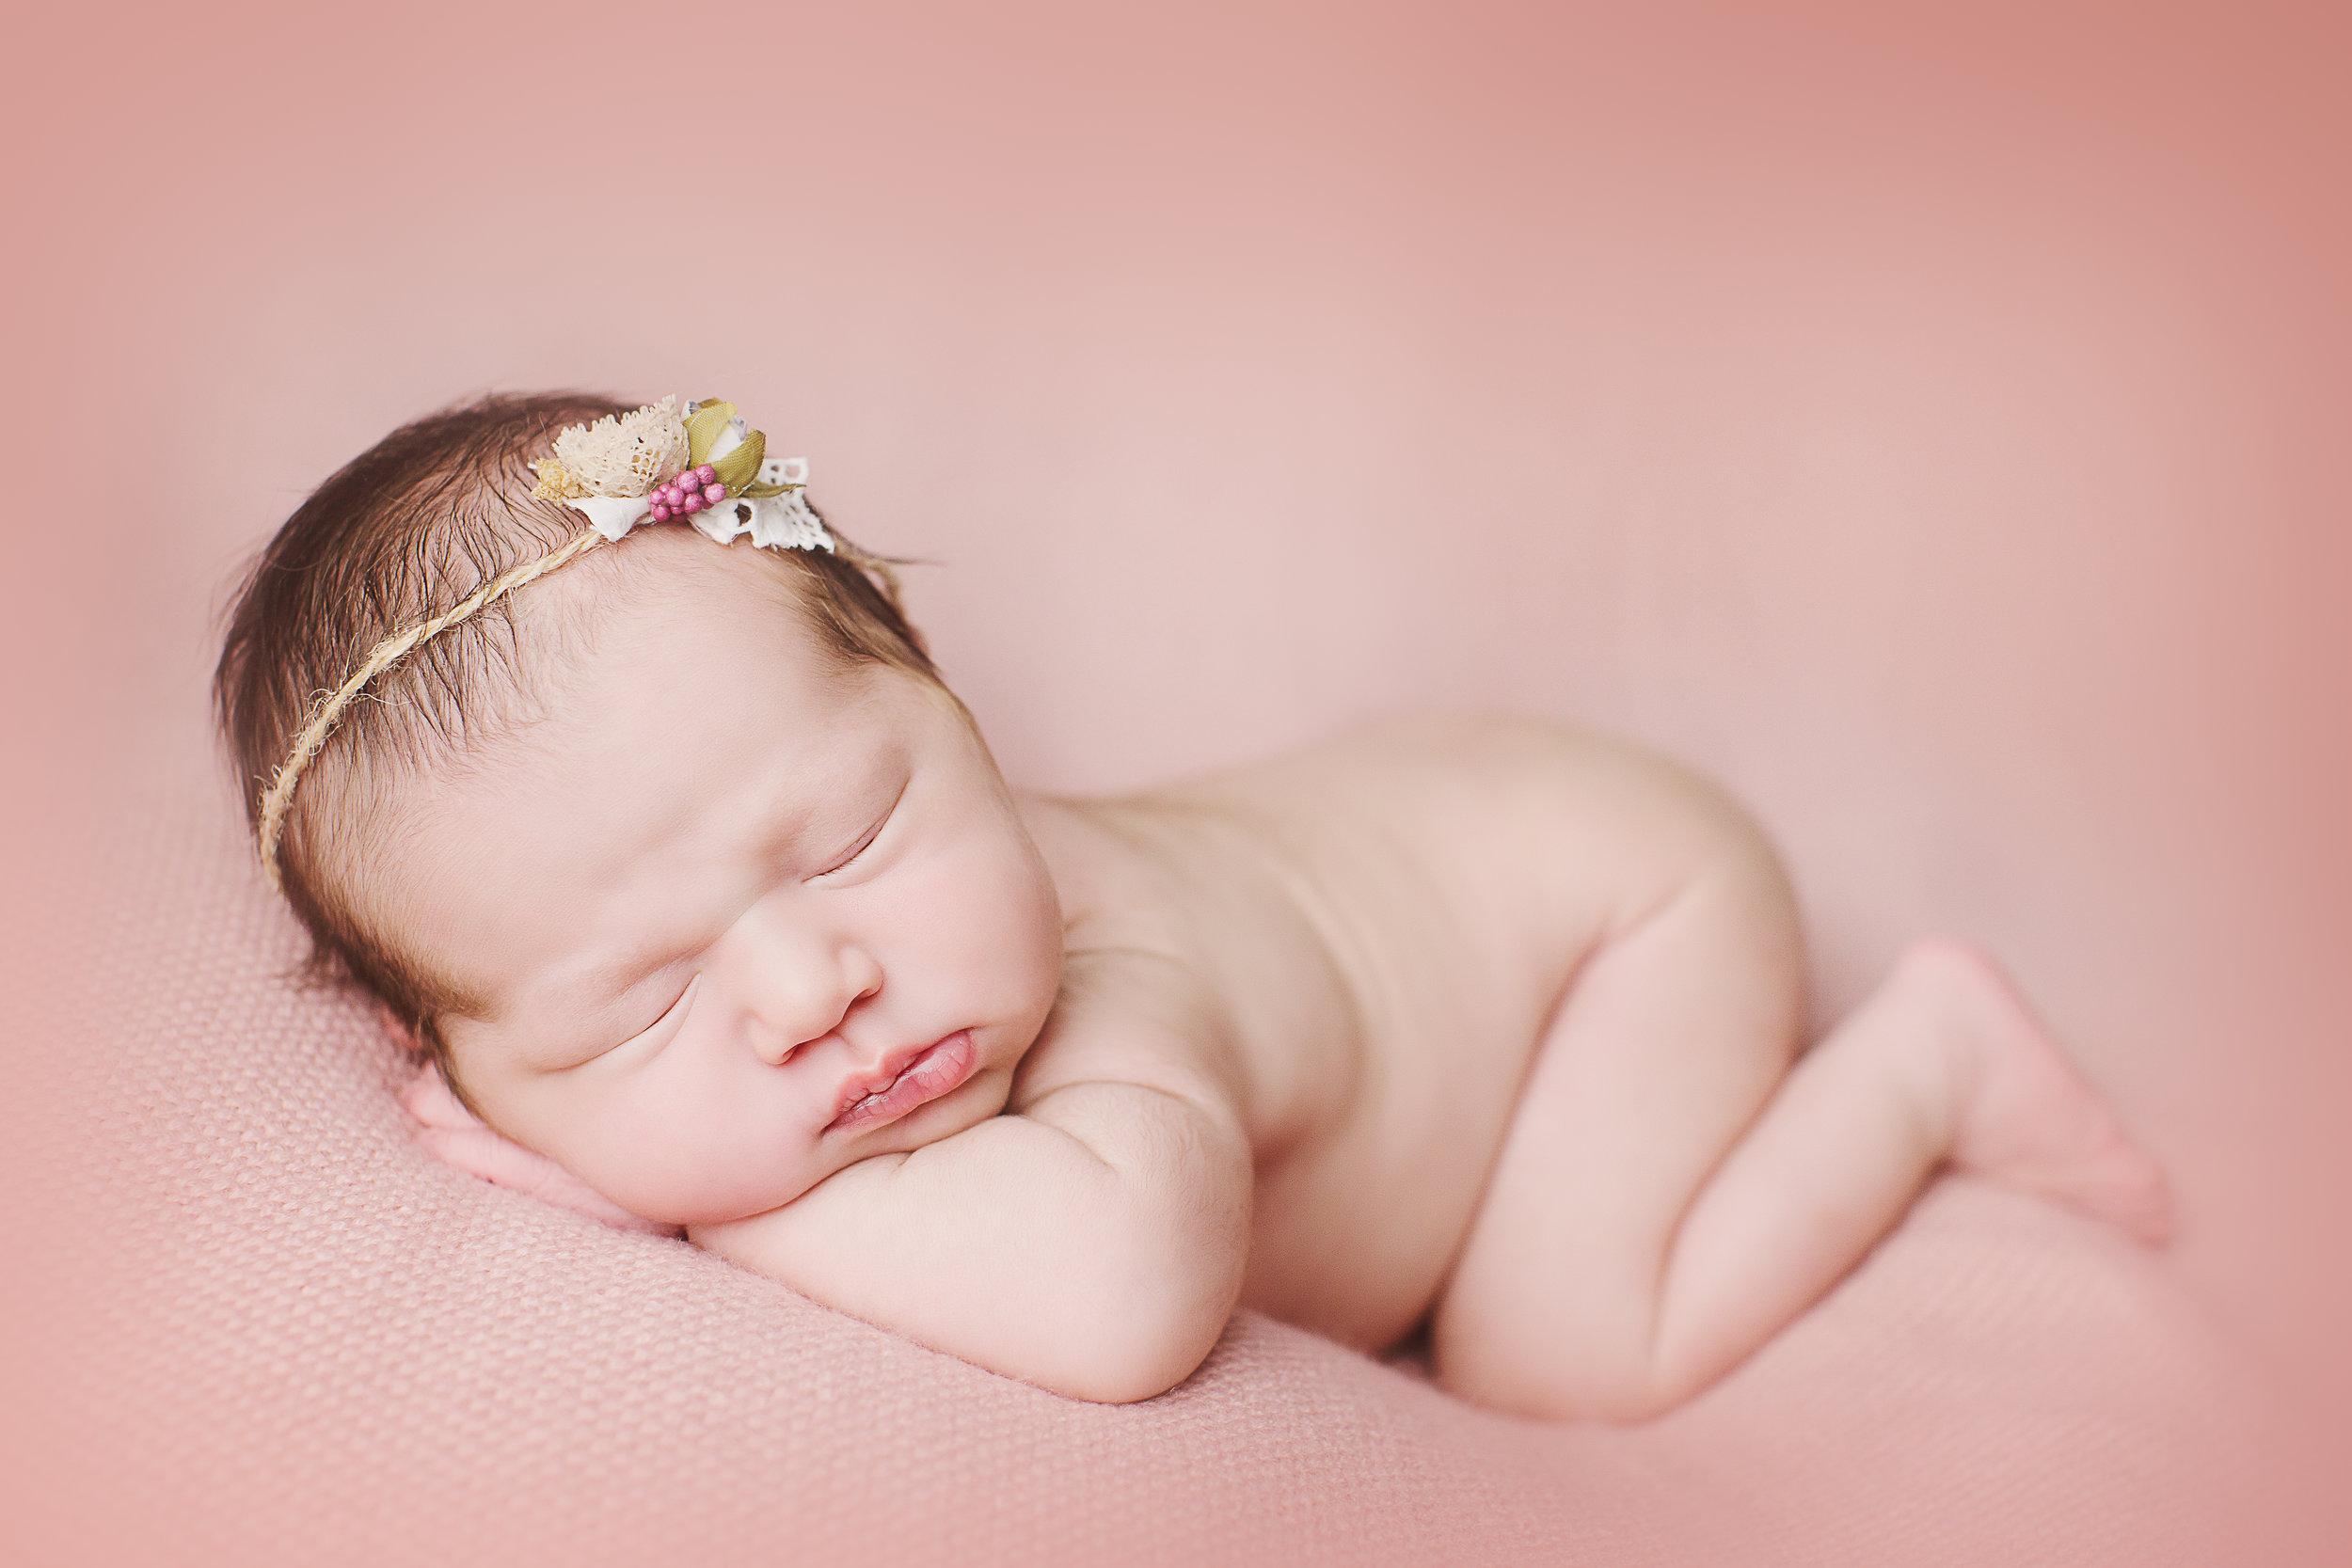 biancamorellophotography-vanessaL-newborn-17.jpg